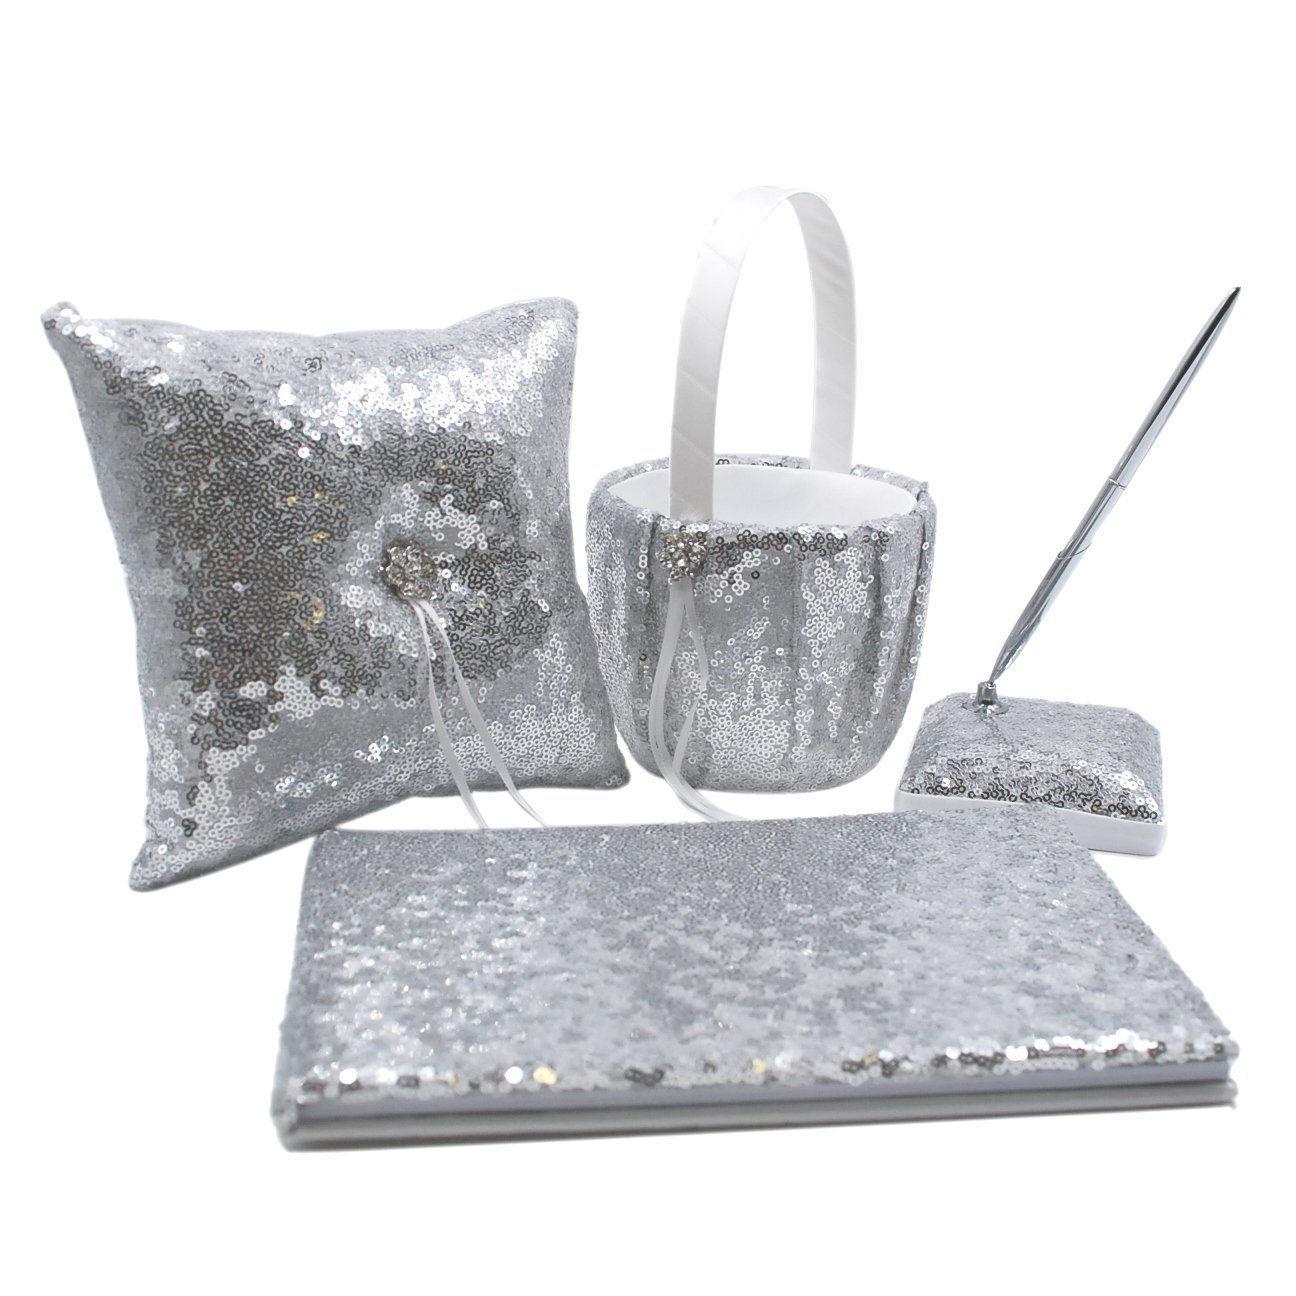 Abbie Home Sequin Glitter Wedding Guest Book + Pen Set + Flower Basket + Ring Bearer Pillow Rhinestone Décor Wedding Party Favor-Silver by Abbie Home